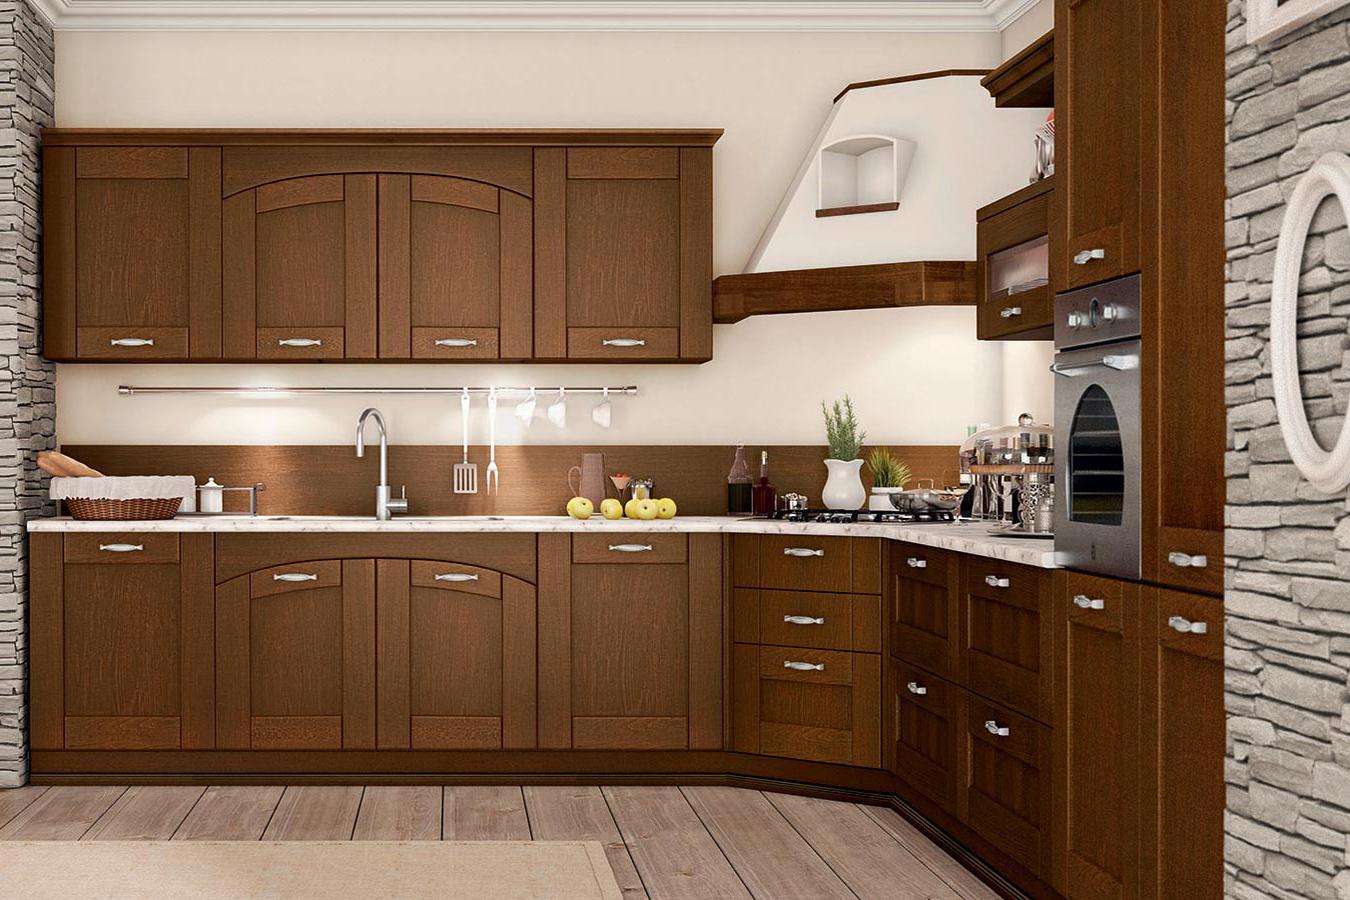 Cucina classica agnese di arredo 3 righetti mobili novara for Idee arredo cucina classica